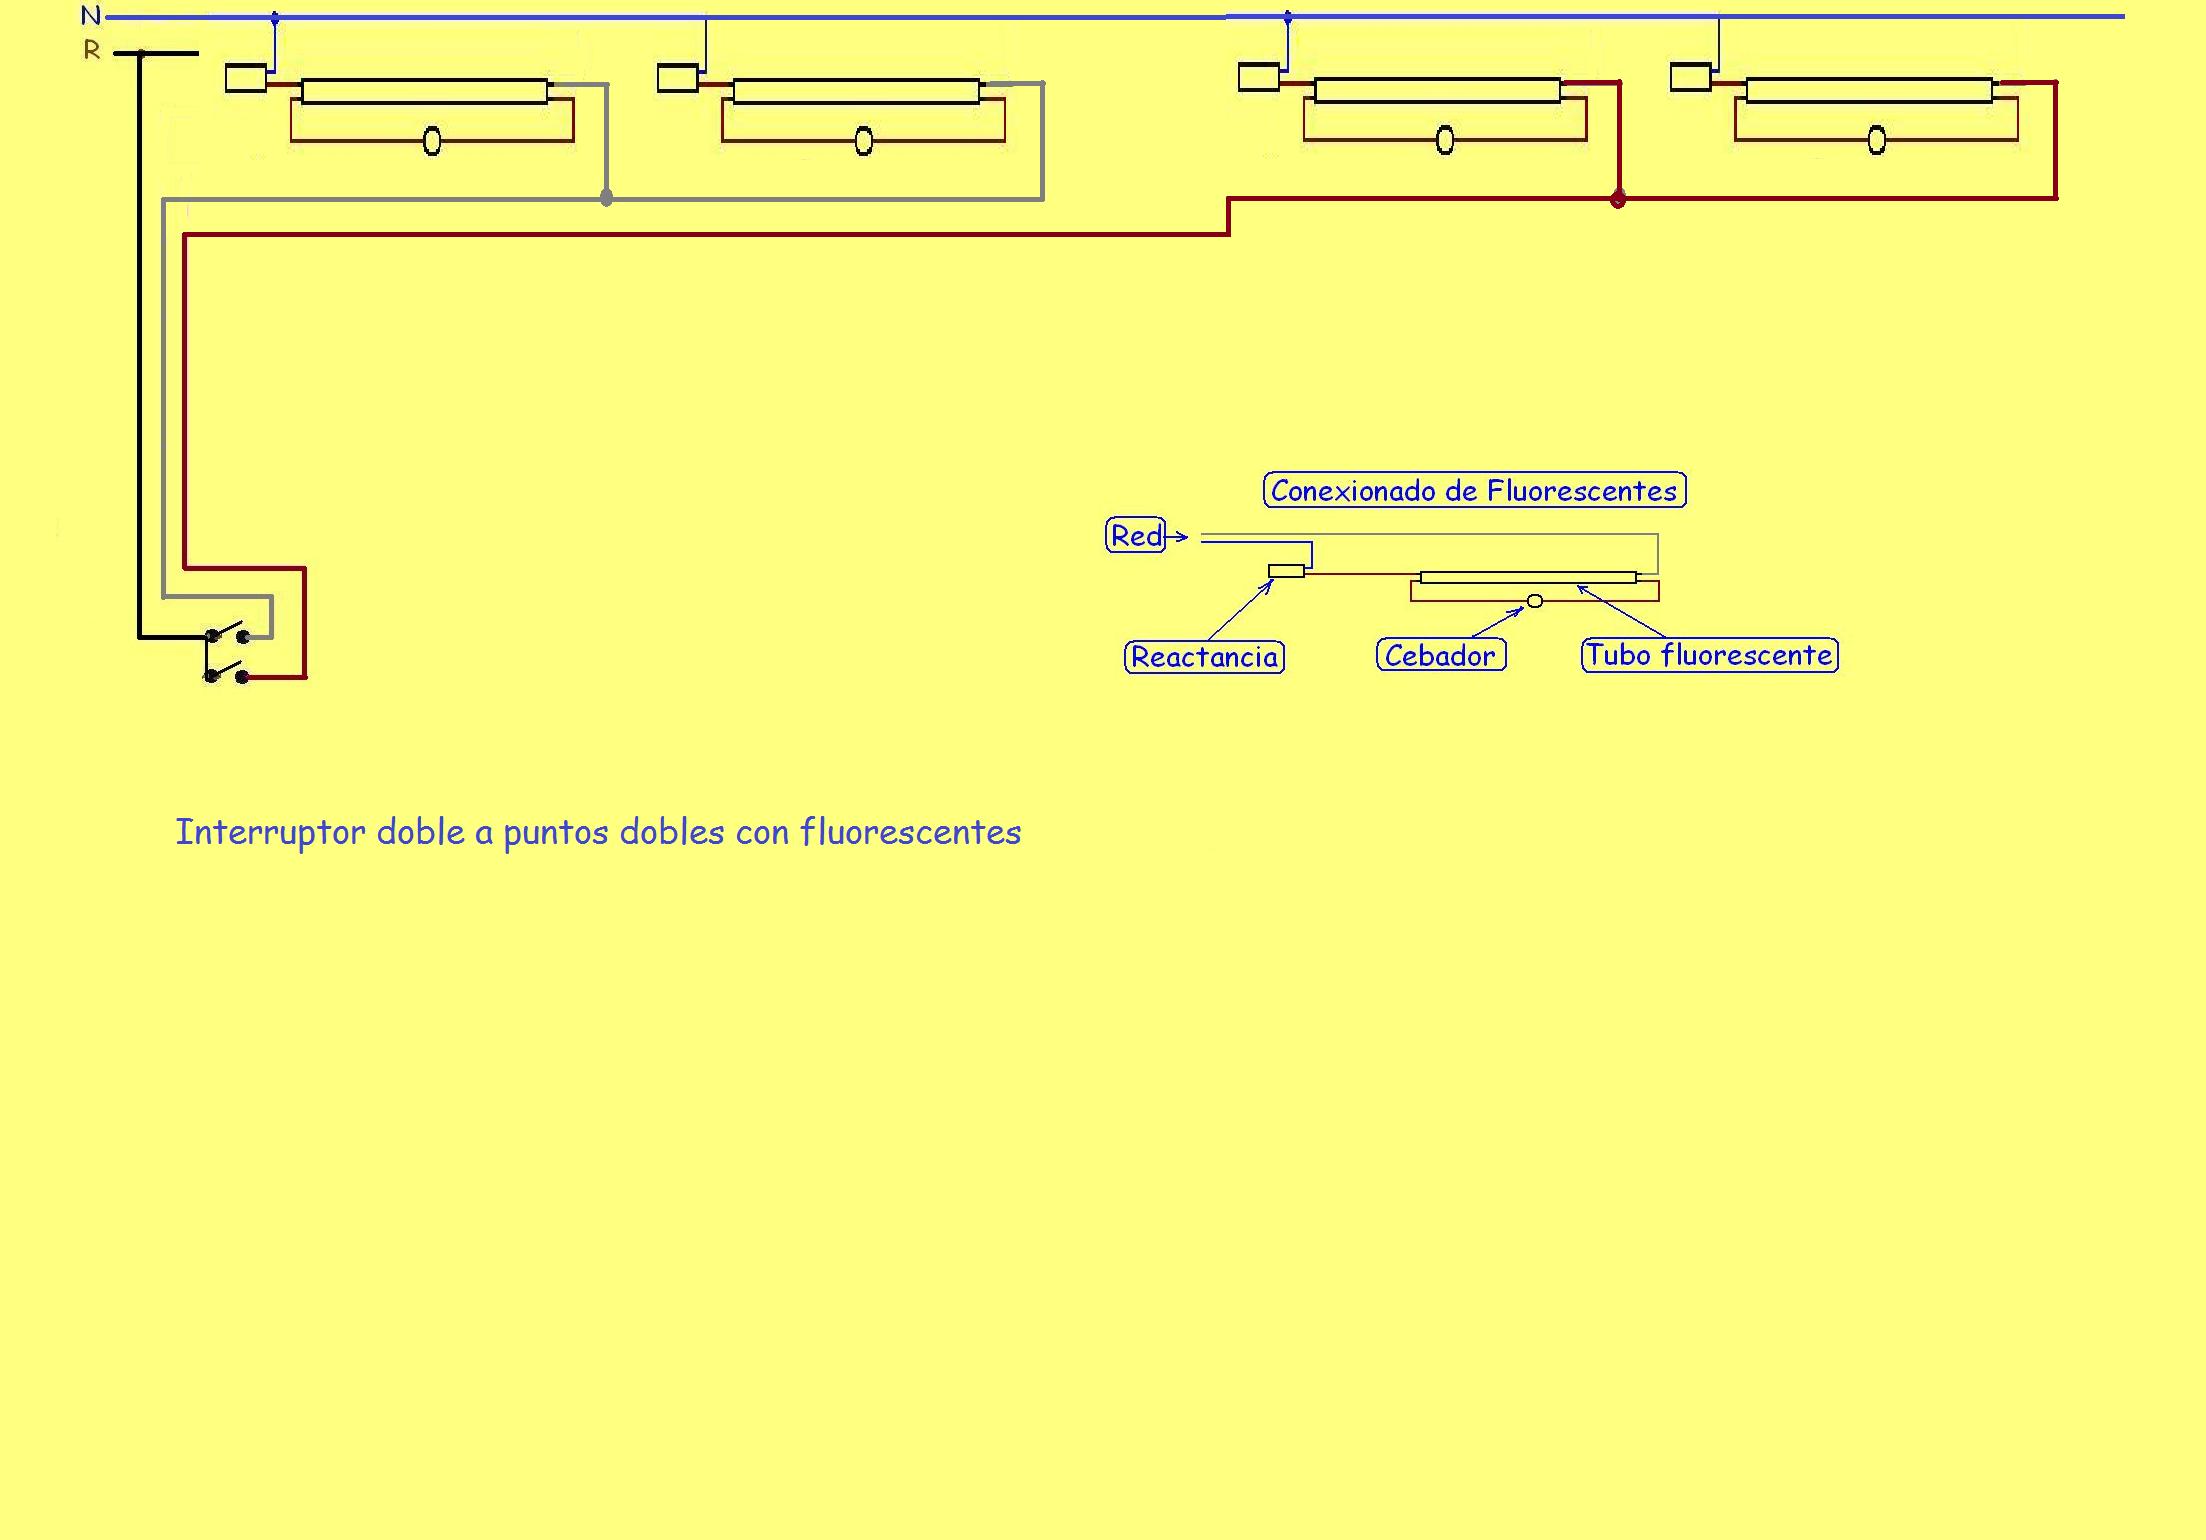 Interruptor doble con puntos dobles confluorescentes